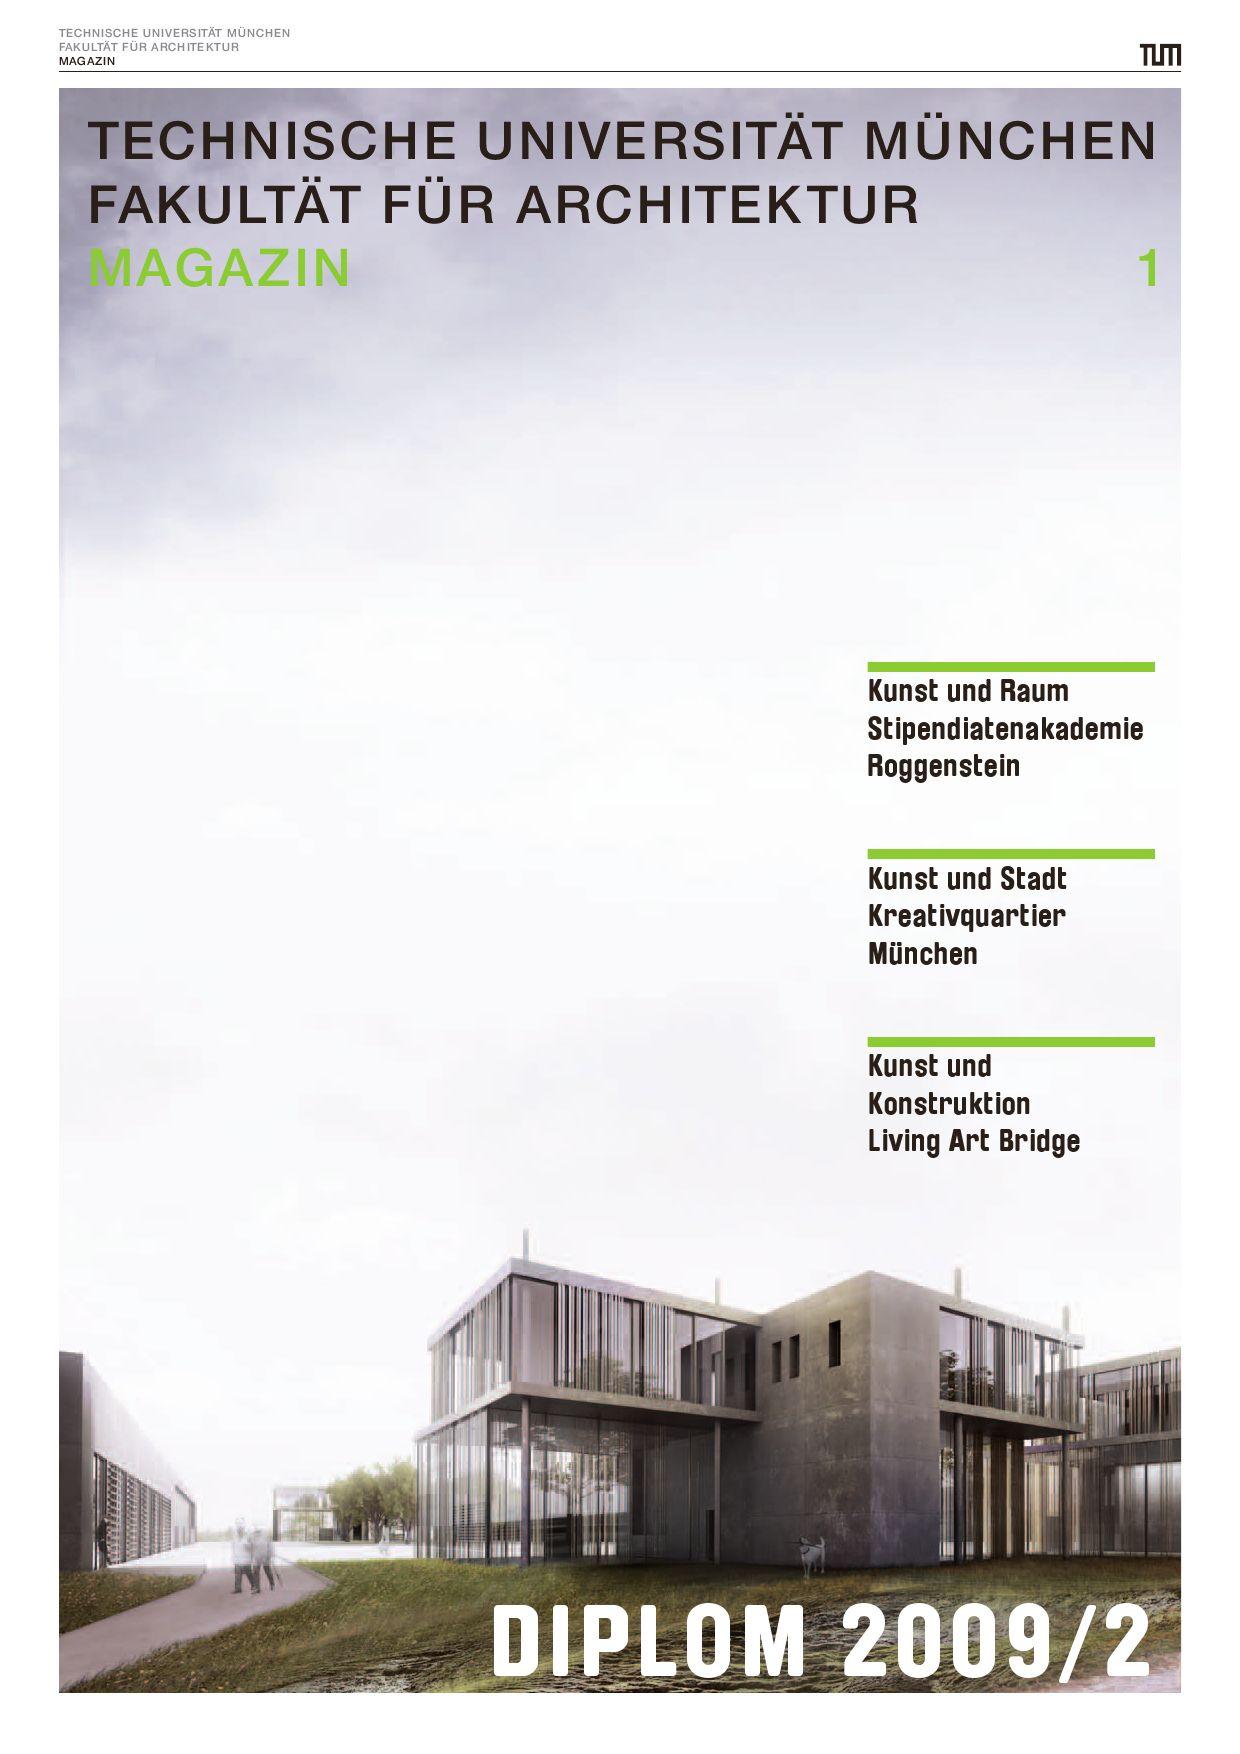 Tum Fakult T F R Architektur Magazin Diplom 2009 2 By